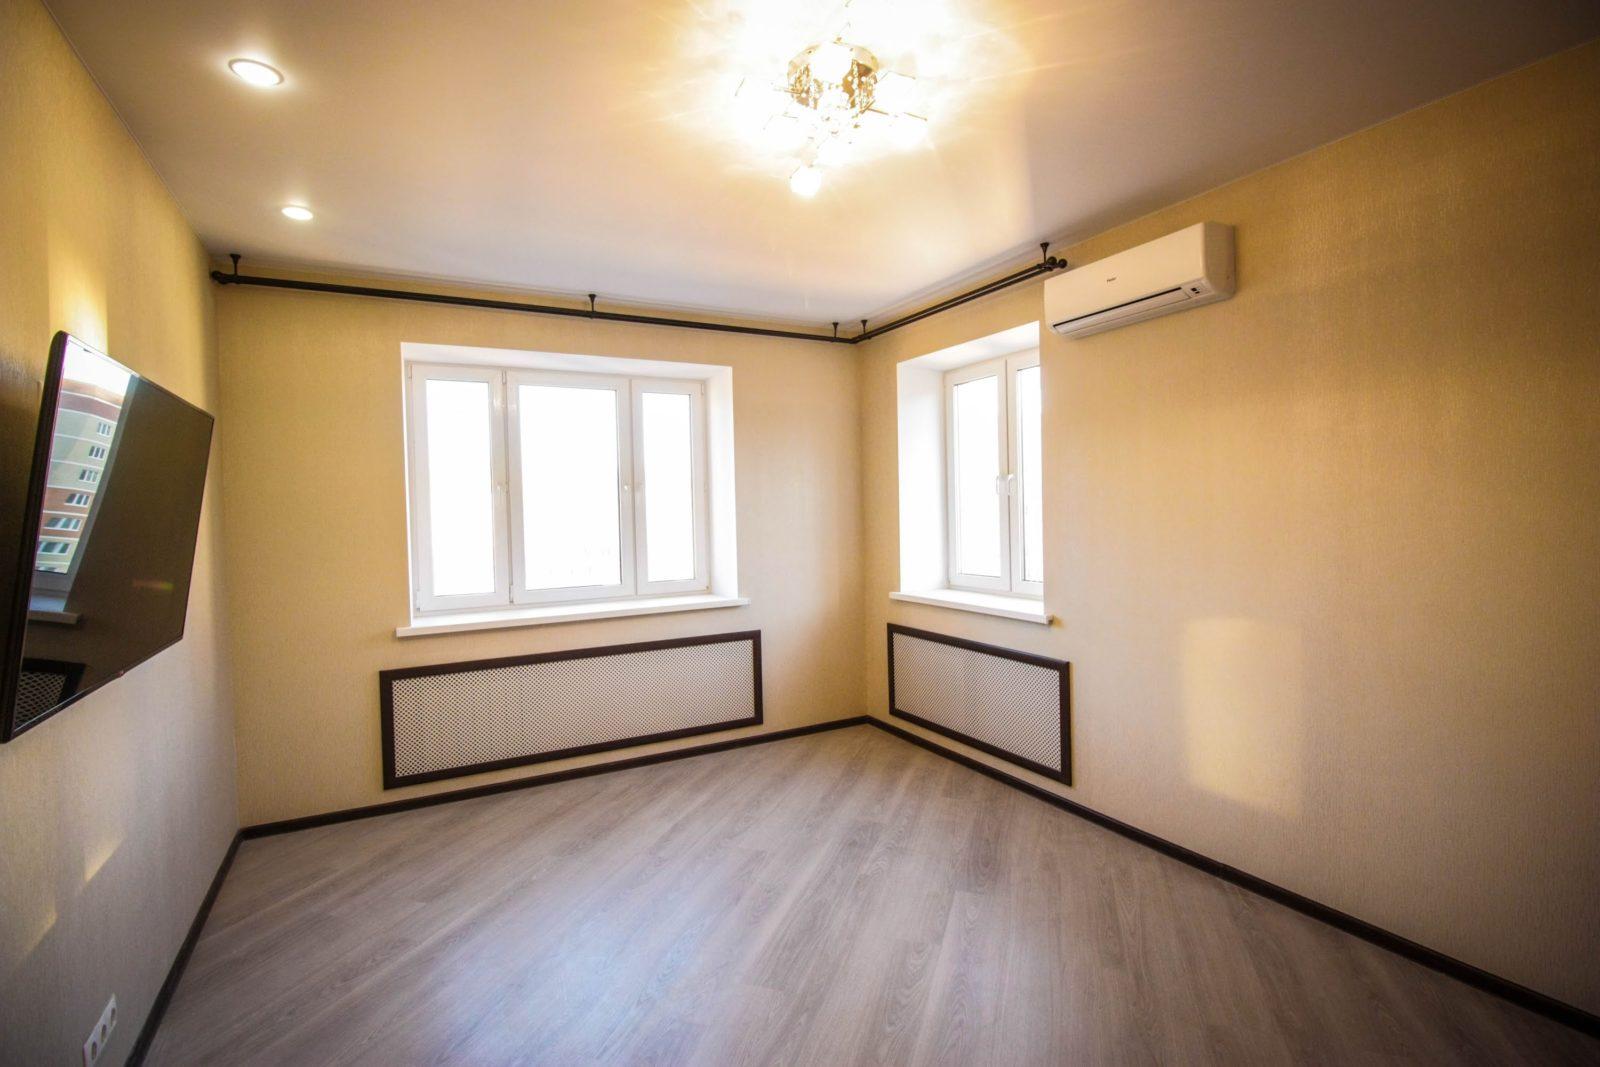 remont-kvartir-pod-klyuch-komfort-7-1600x1067